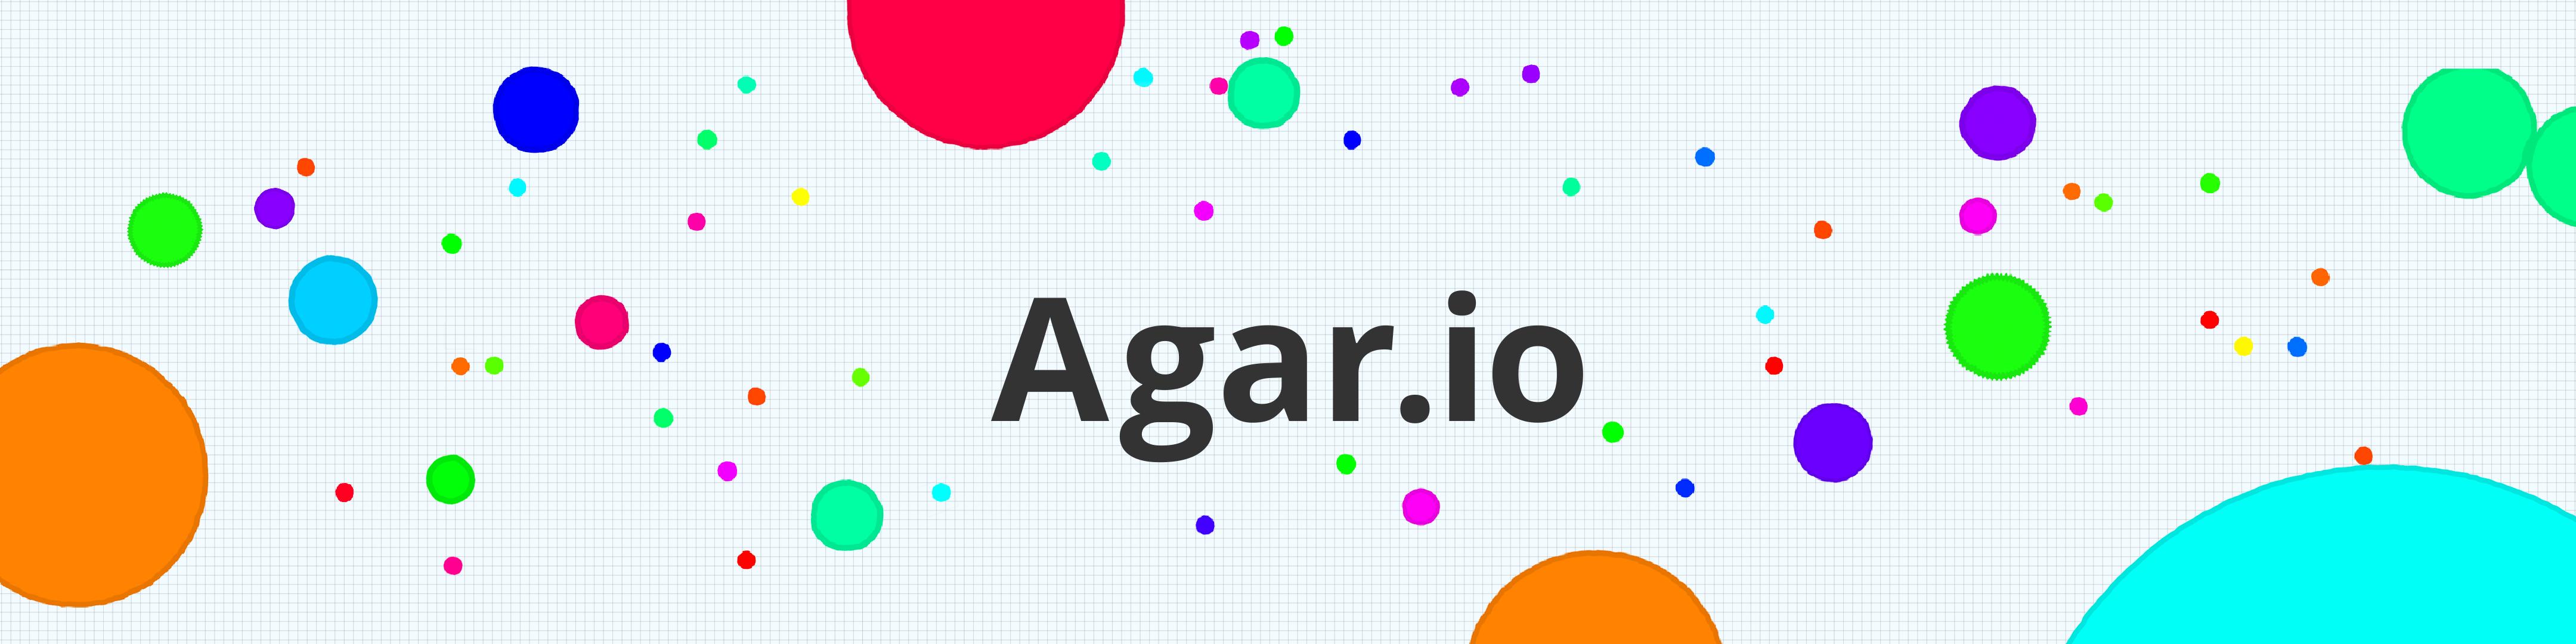 Agar io - Revenue & Download estimates - Apple App Store